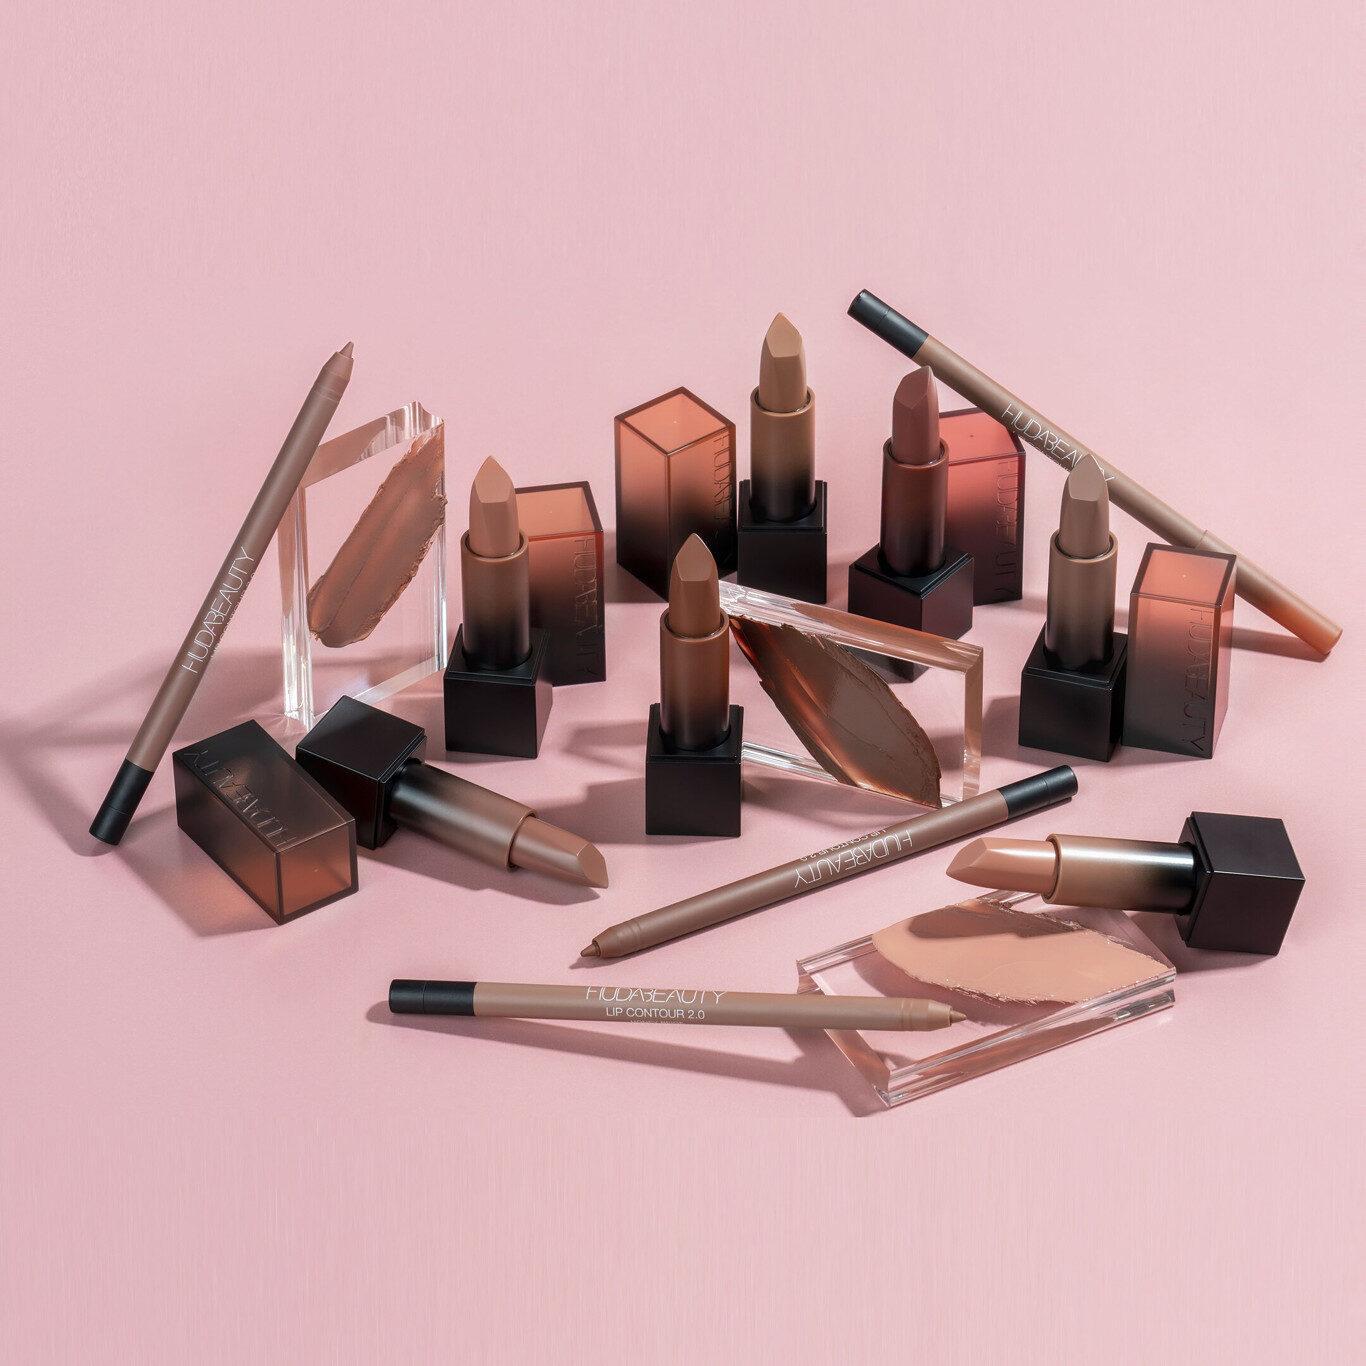 Huda Beauty Power Bullet Cream Glow & Lip Contour 2.0 Promo